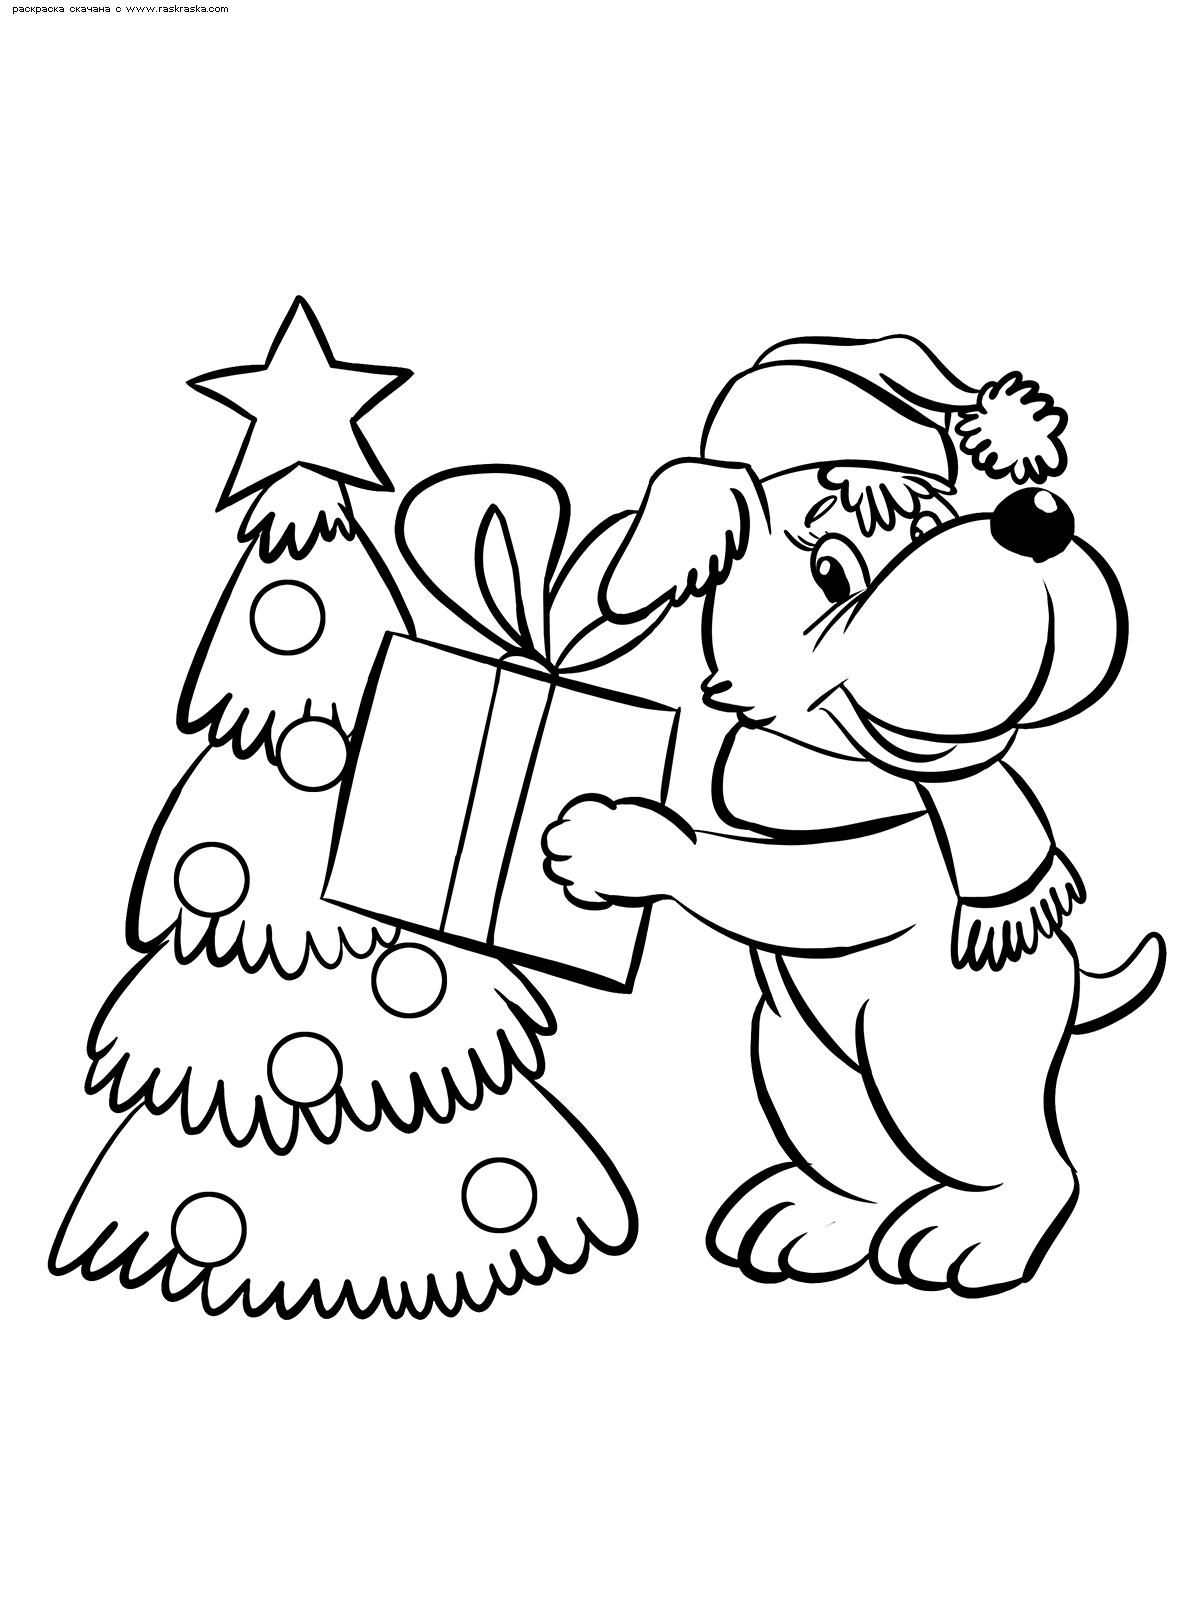 Раскраска Новый год . Раскраска новый год, собака, подарок, елка